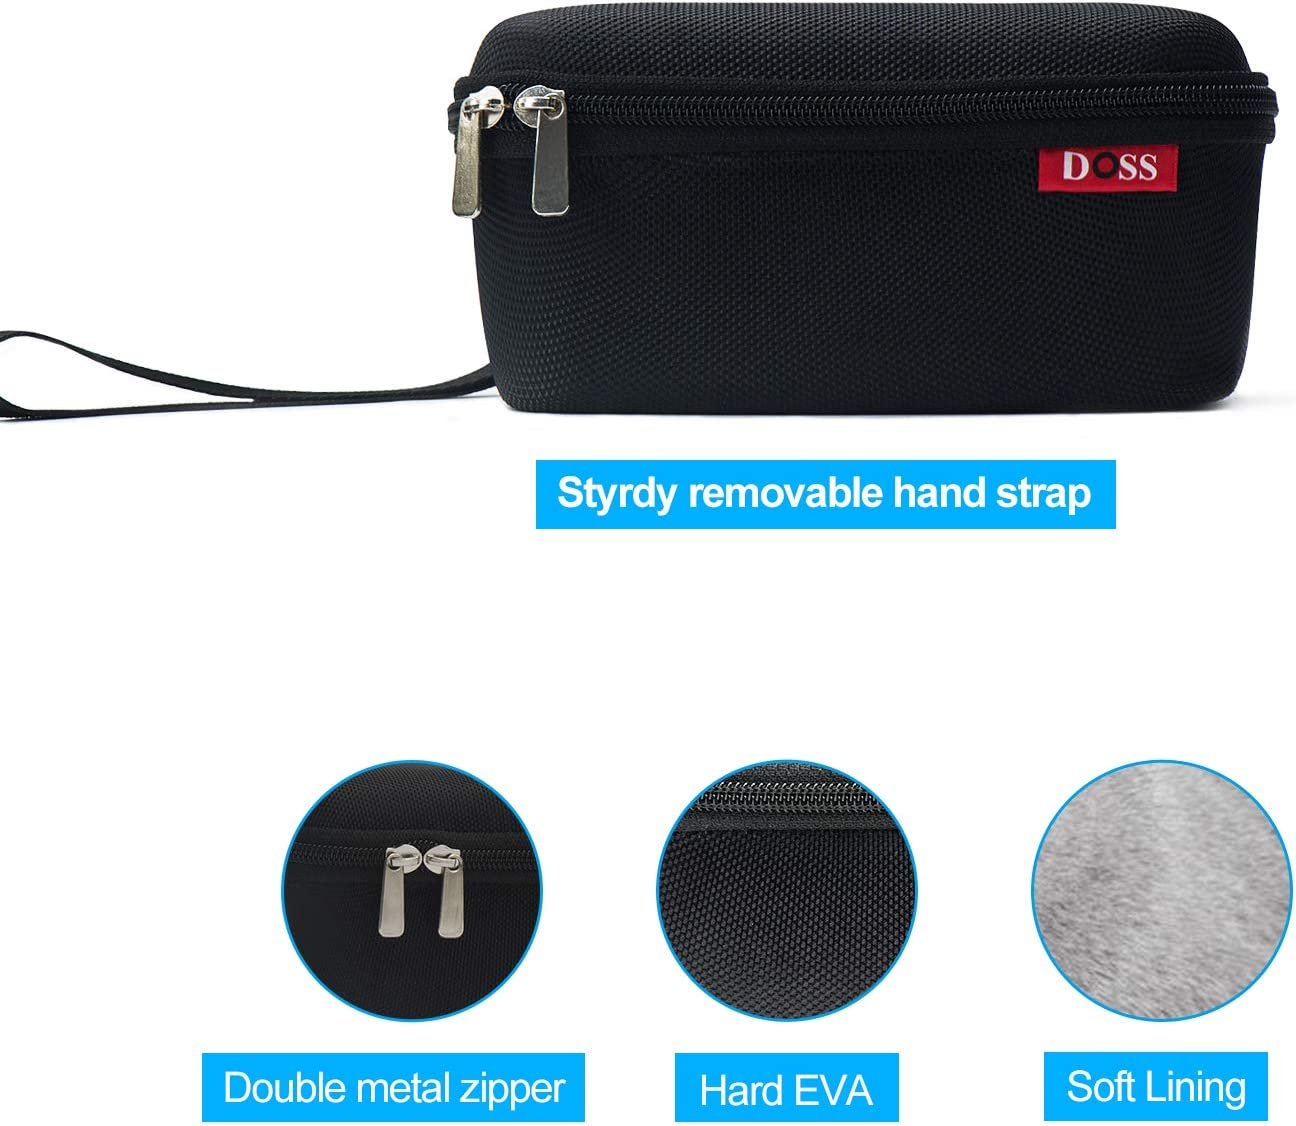 Black DOSS SoundBox Official Protective Hard EVA Travel Case